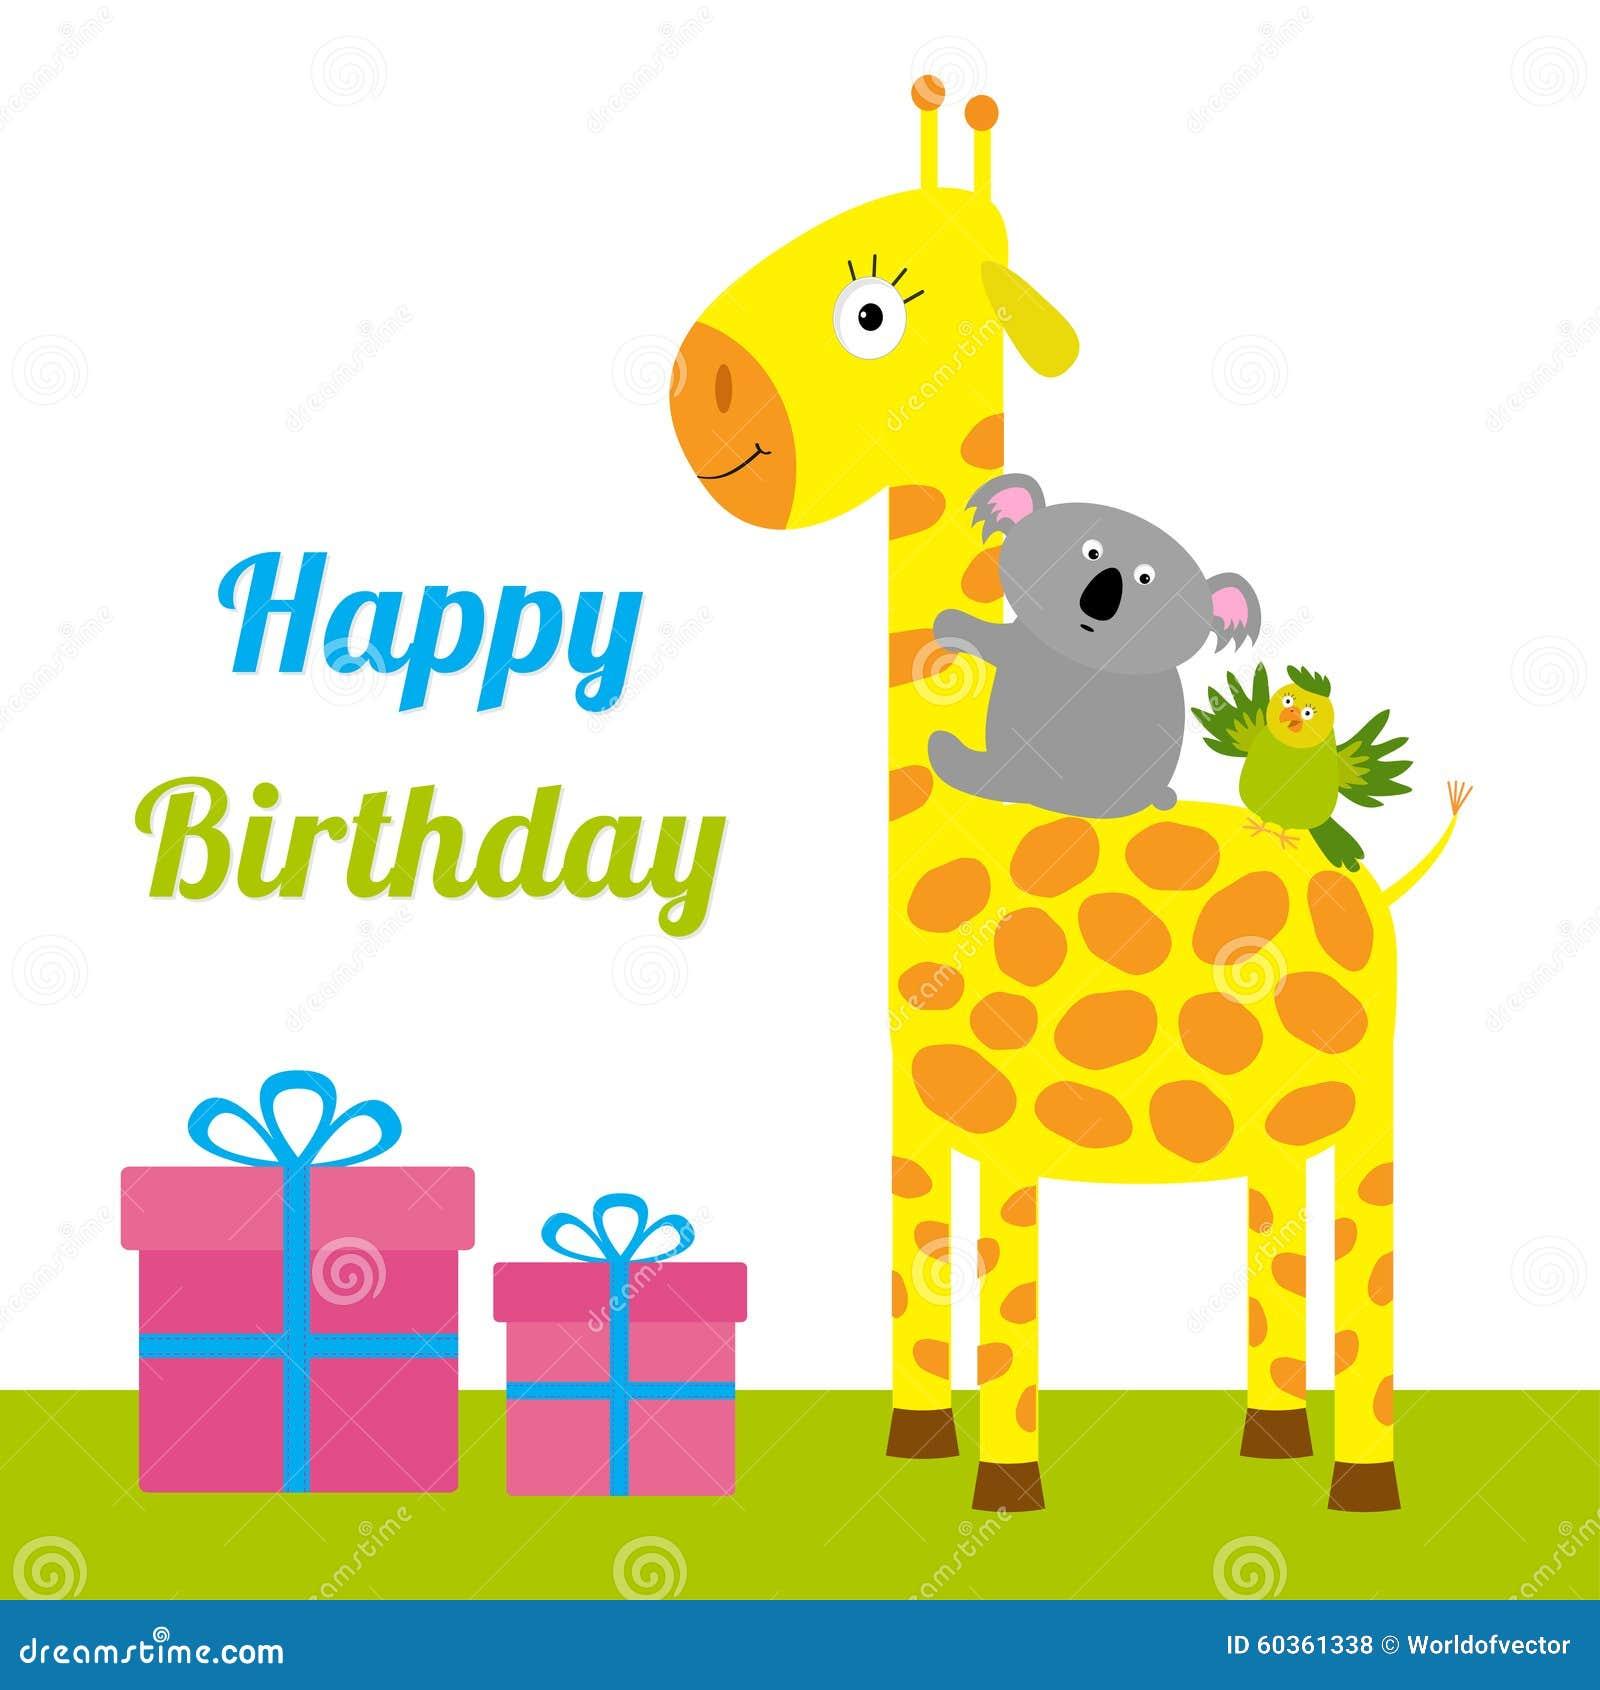 Happy birthday card with cute giraffe koala and parrot giftbox set happy birthday card with cute giraffe koala and parrot giftbox set baby background flat design bookmarktalkfo Choice Image